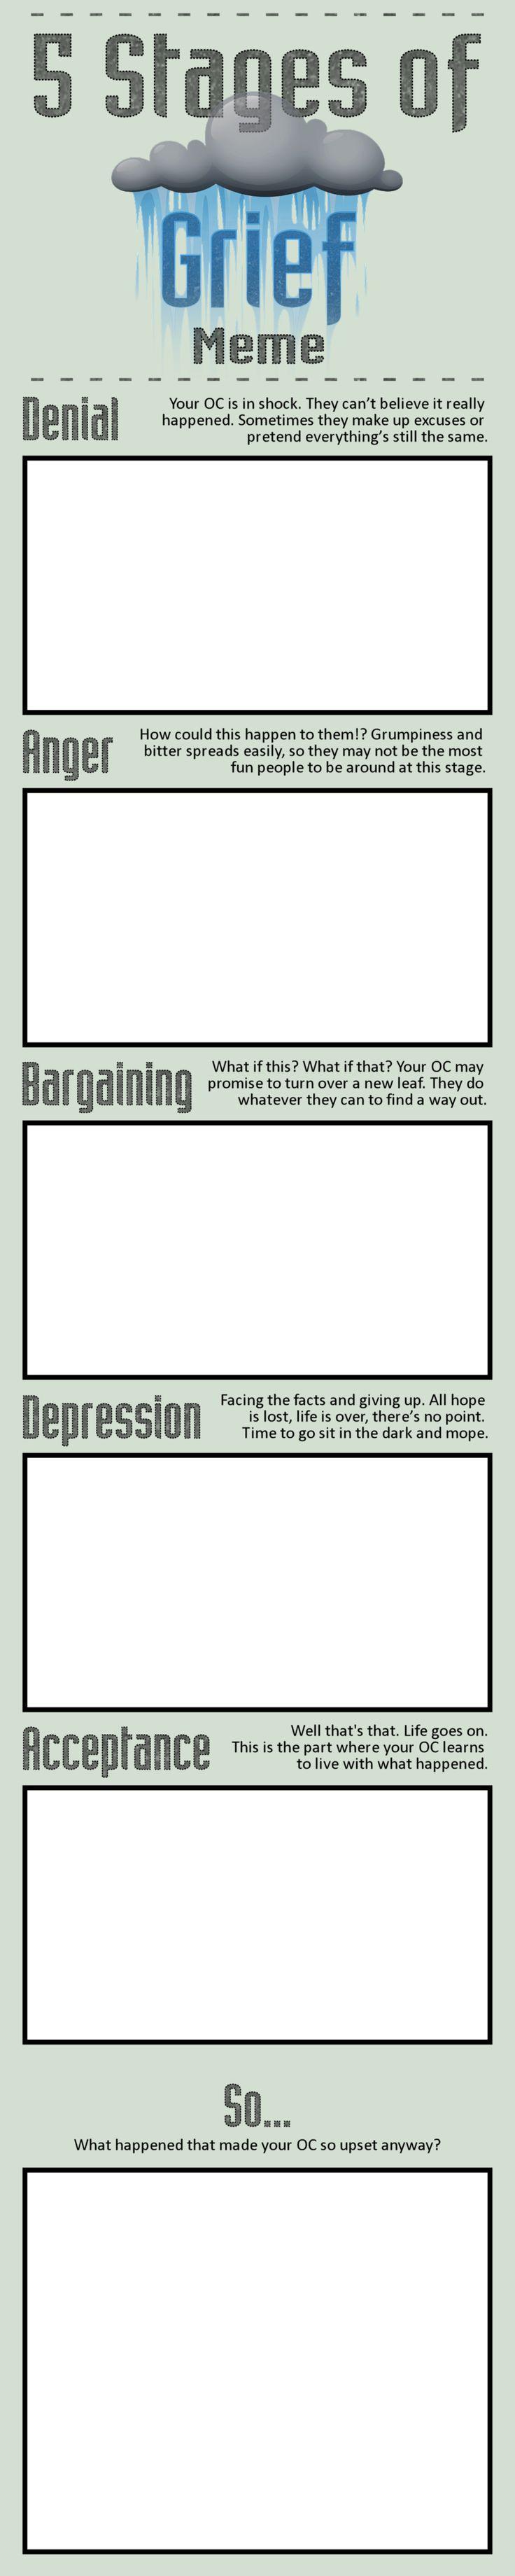 5 Stages of Grief Meme by Jabnormalities.deviantart.com on @DeviantArt